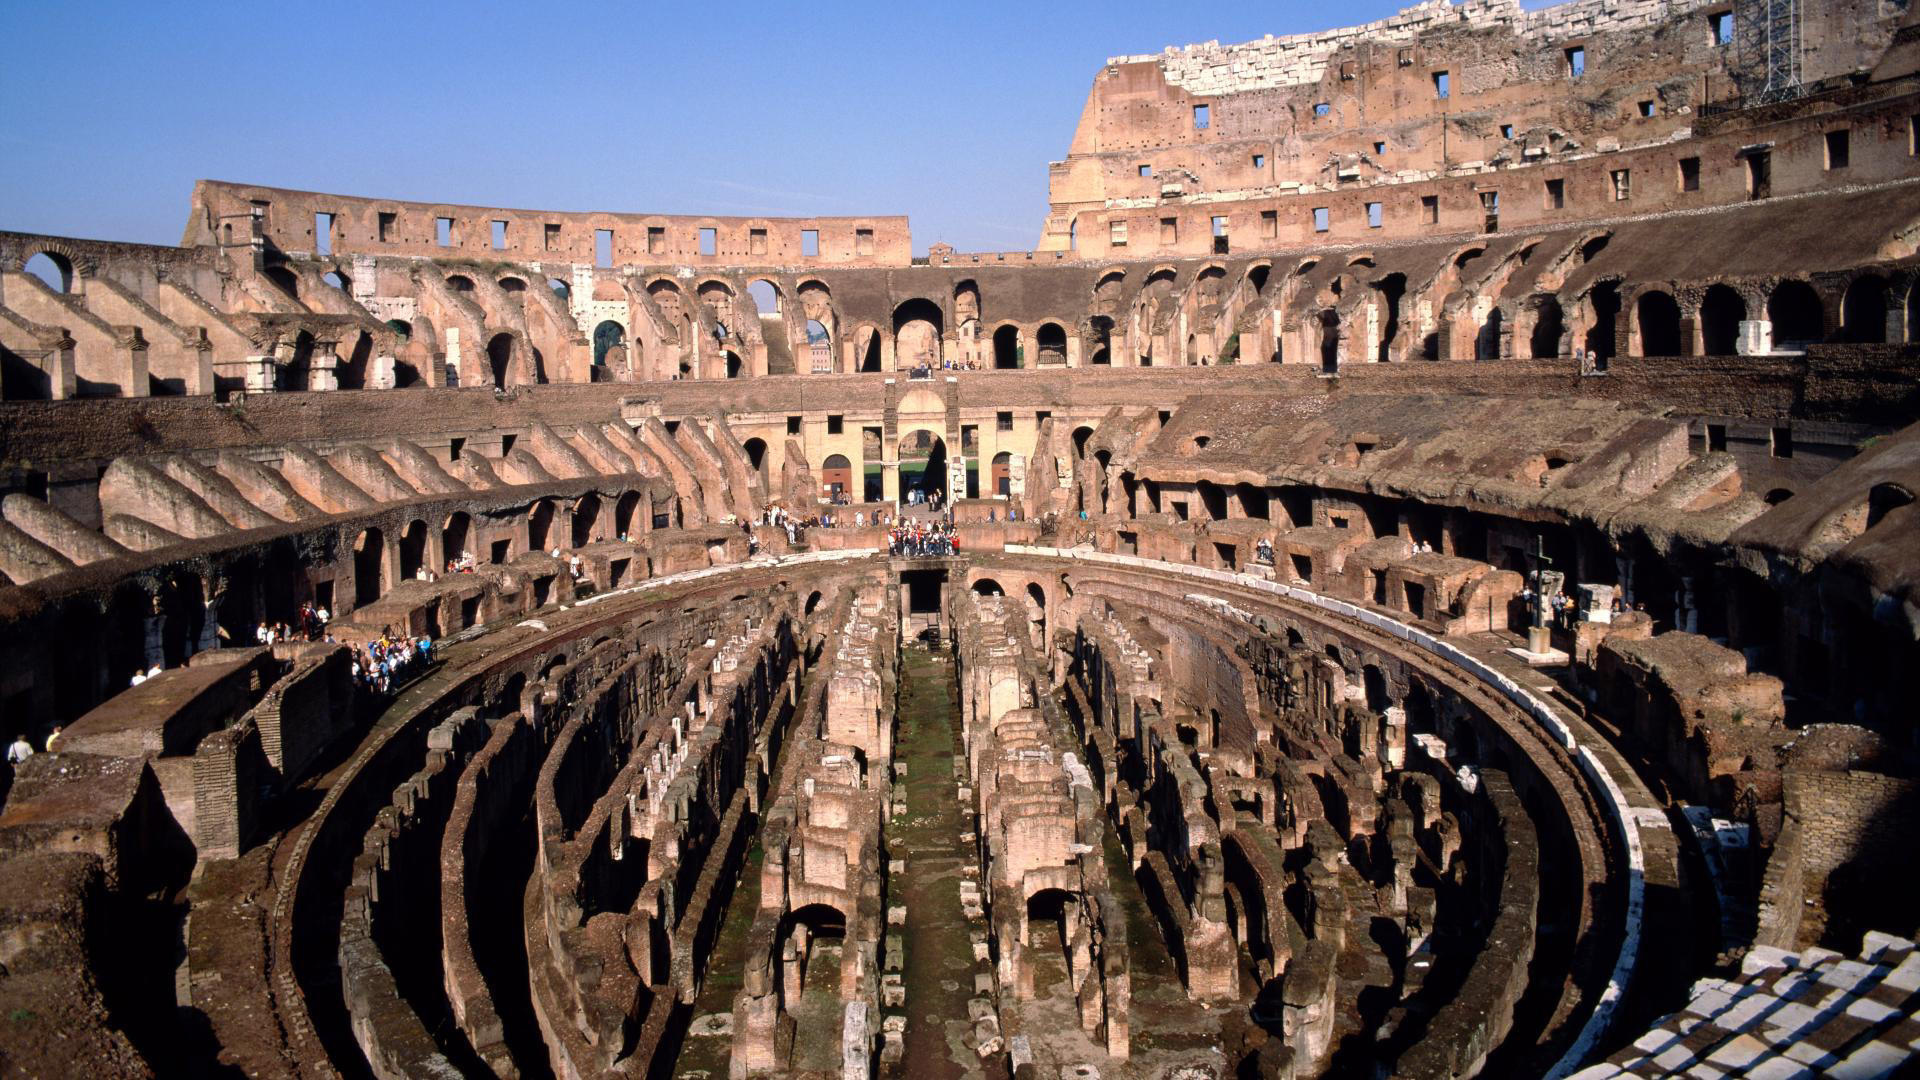 Desktop wallpapers World Italy Inside the Coliseum in Rome 1920x1080